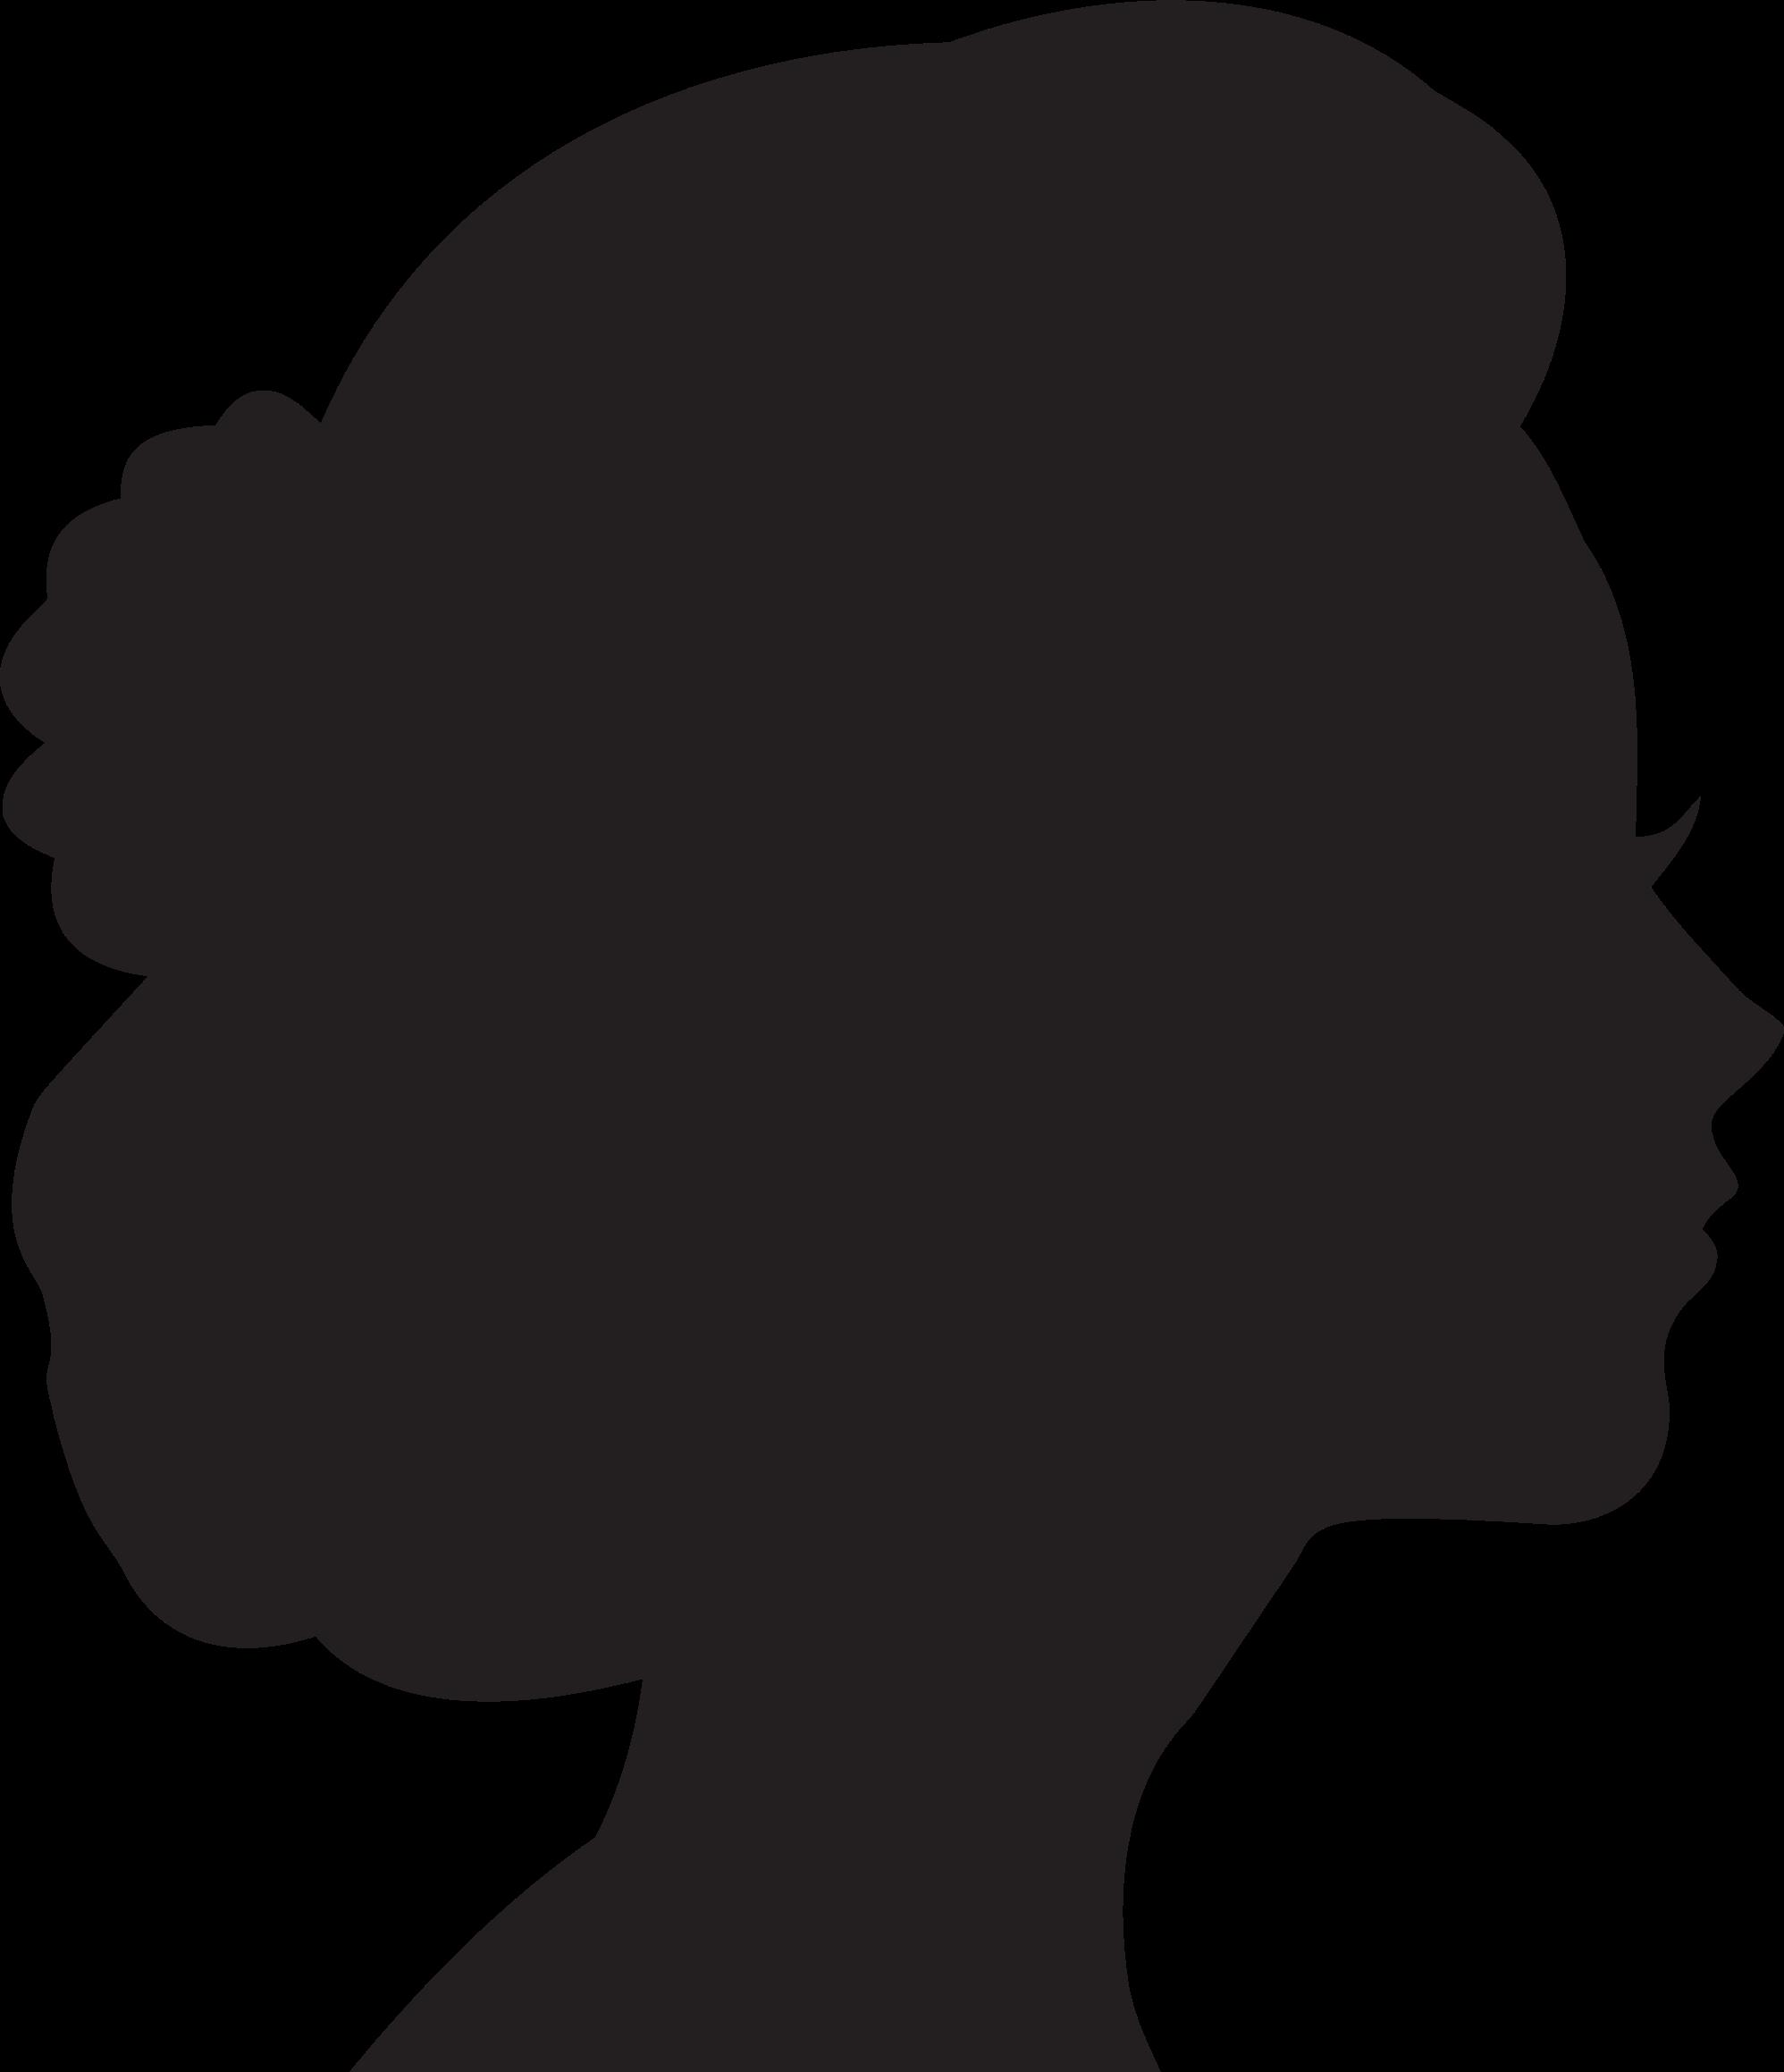 Silhouette woman head at. Neck clipart girl short hair